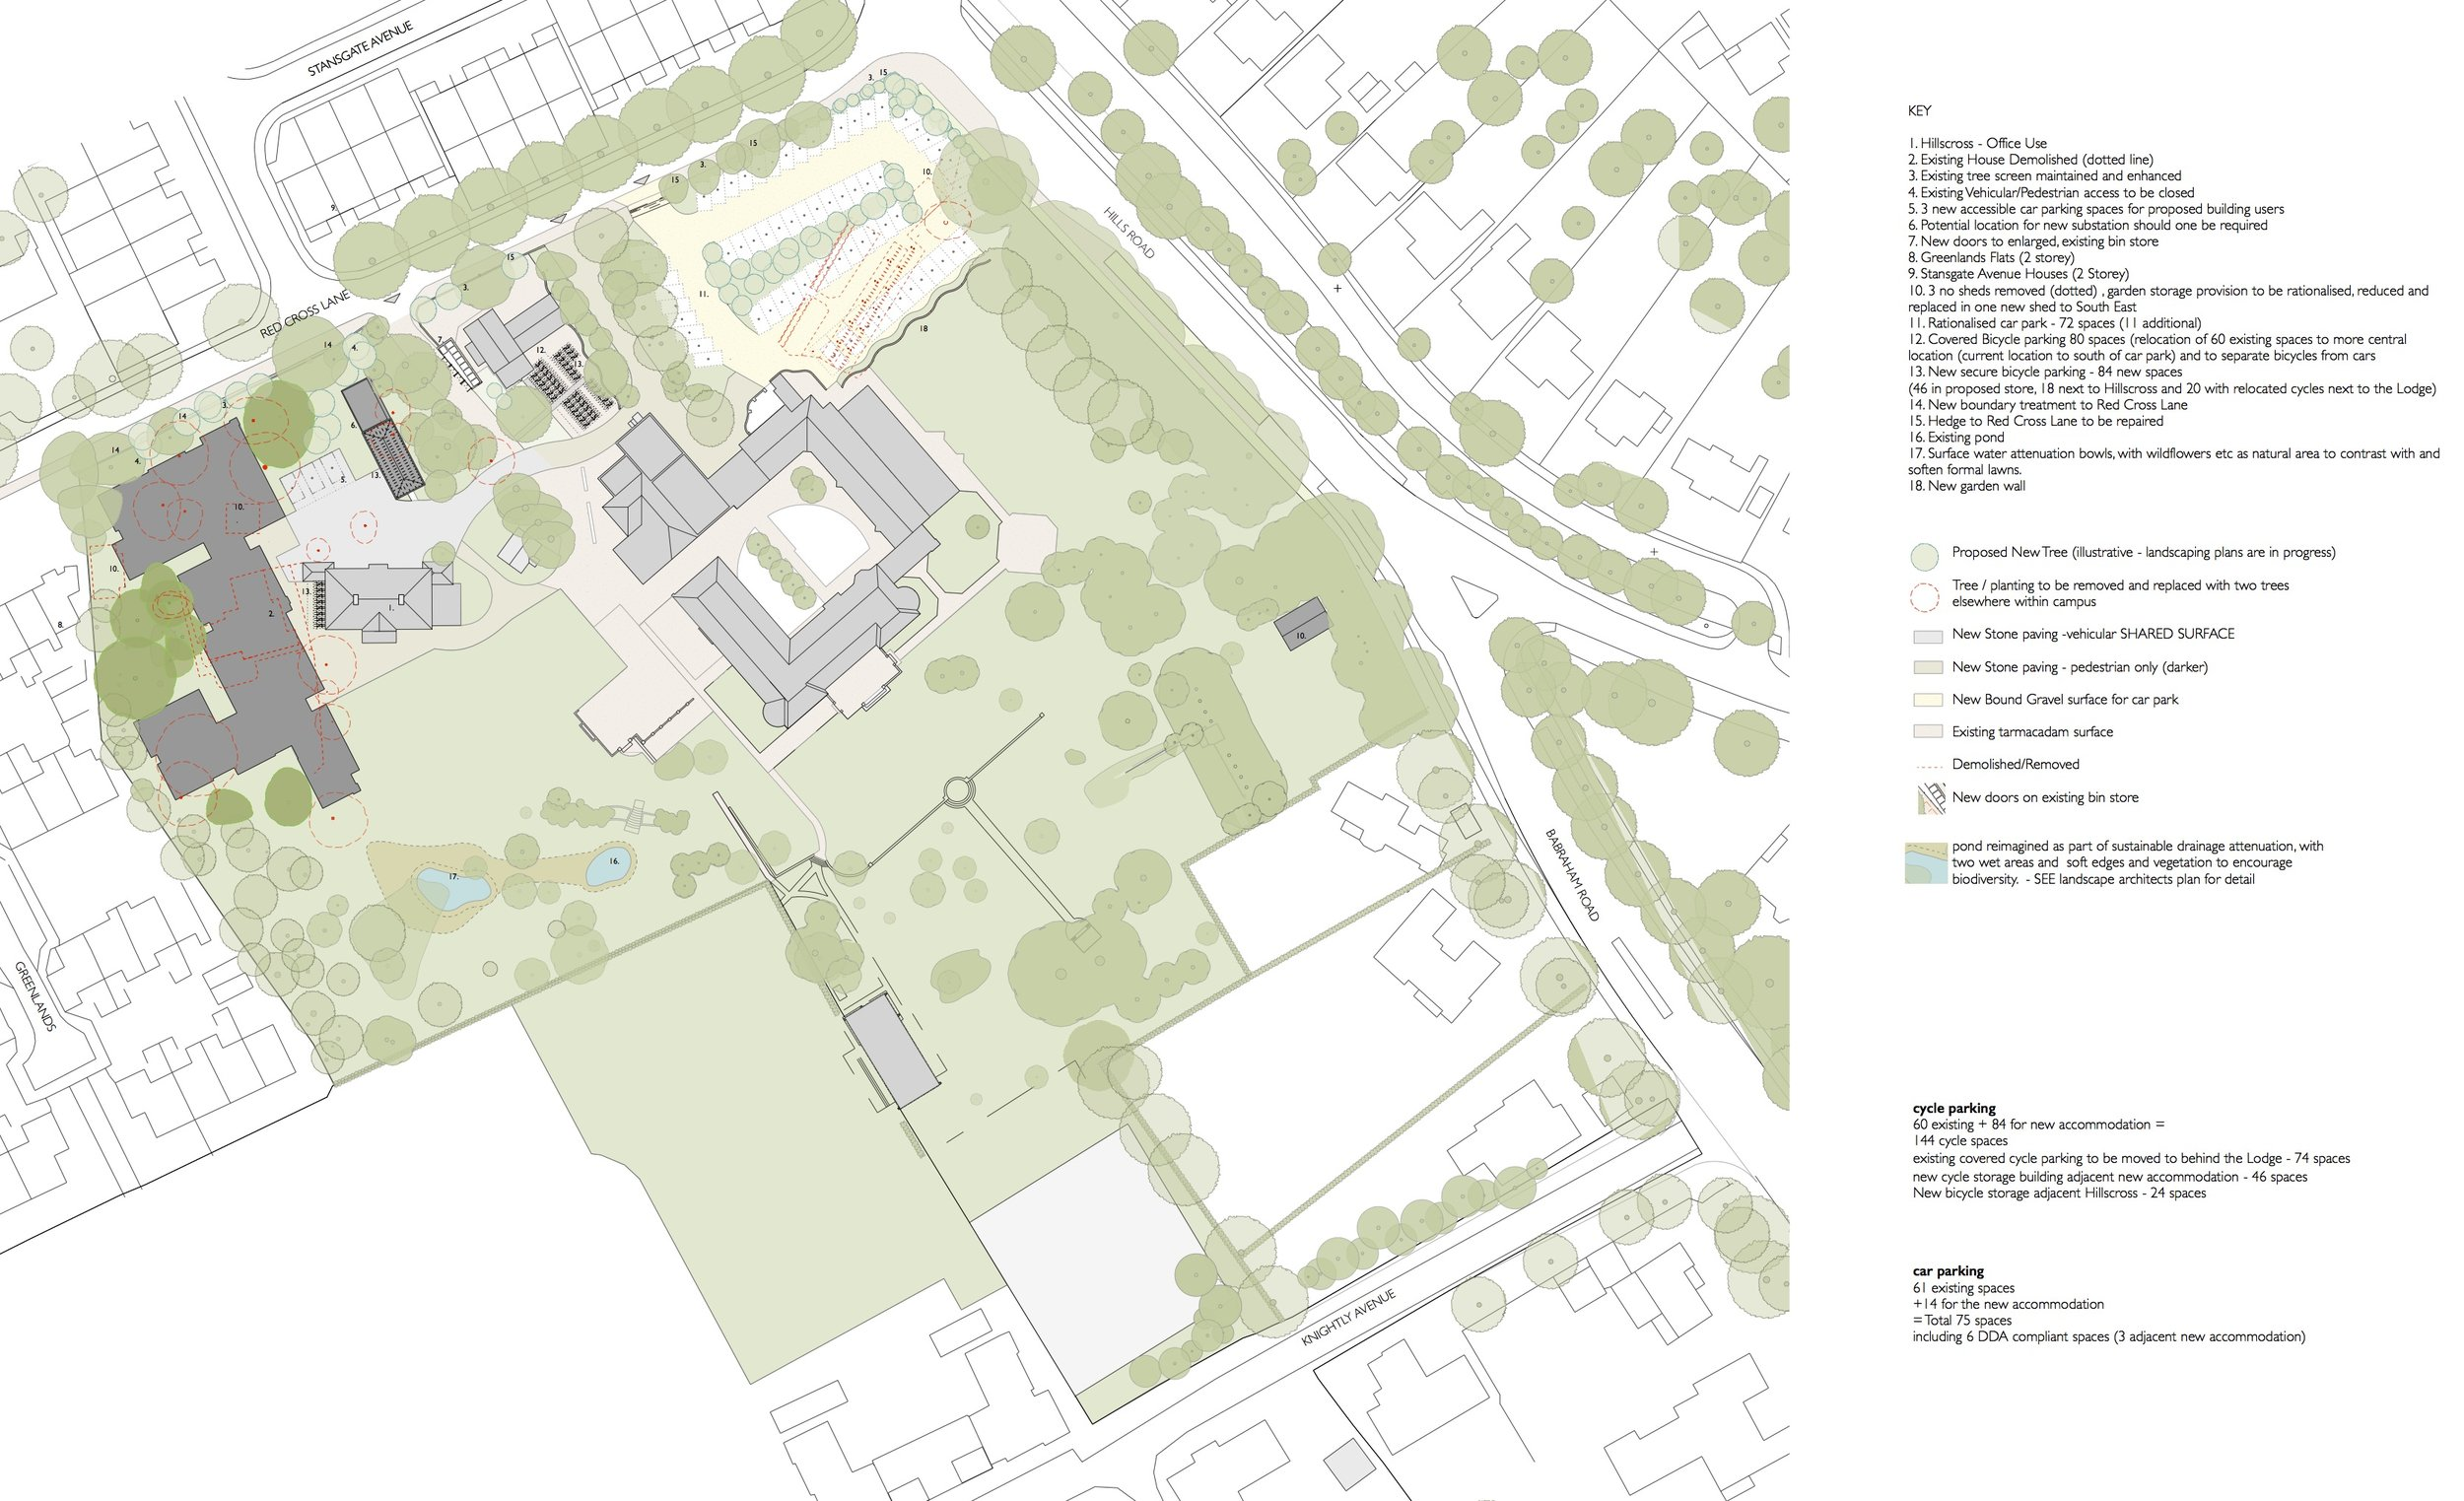 1504-100-Site Plan_P1b.jpg